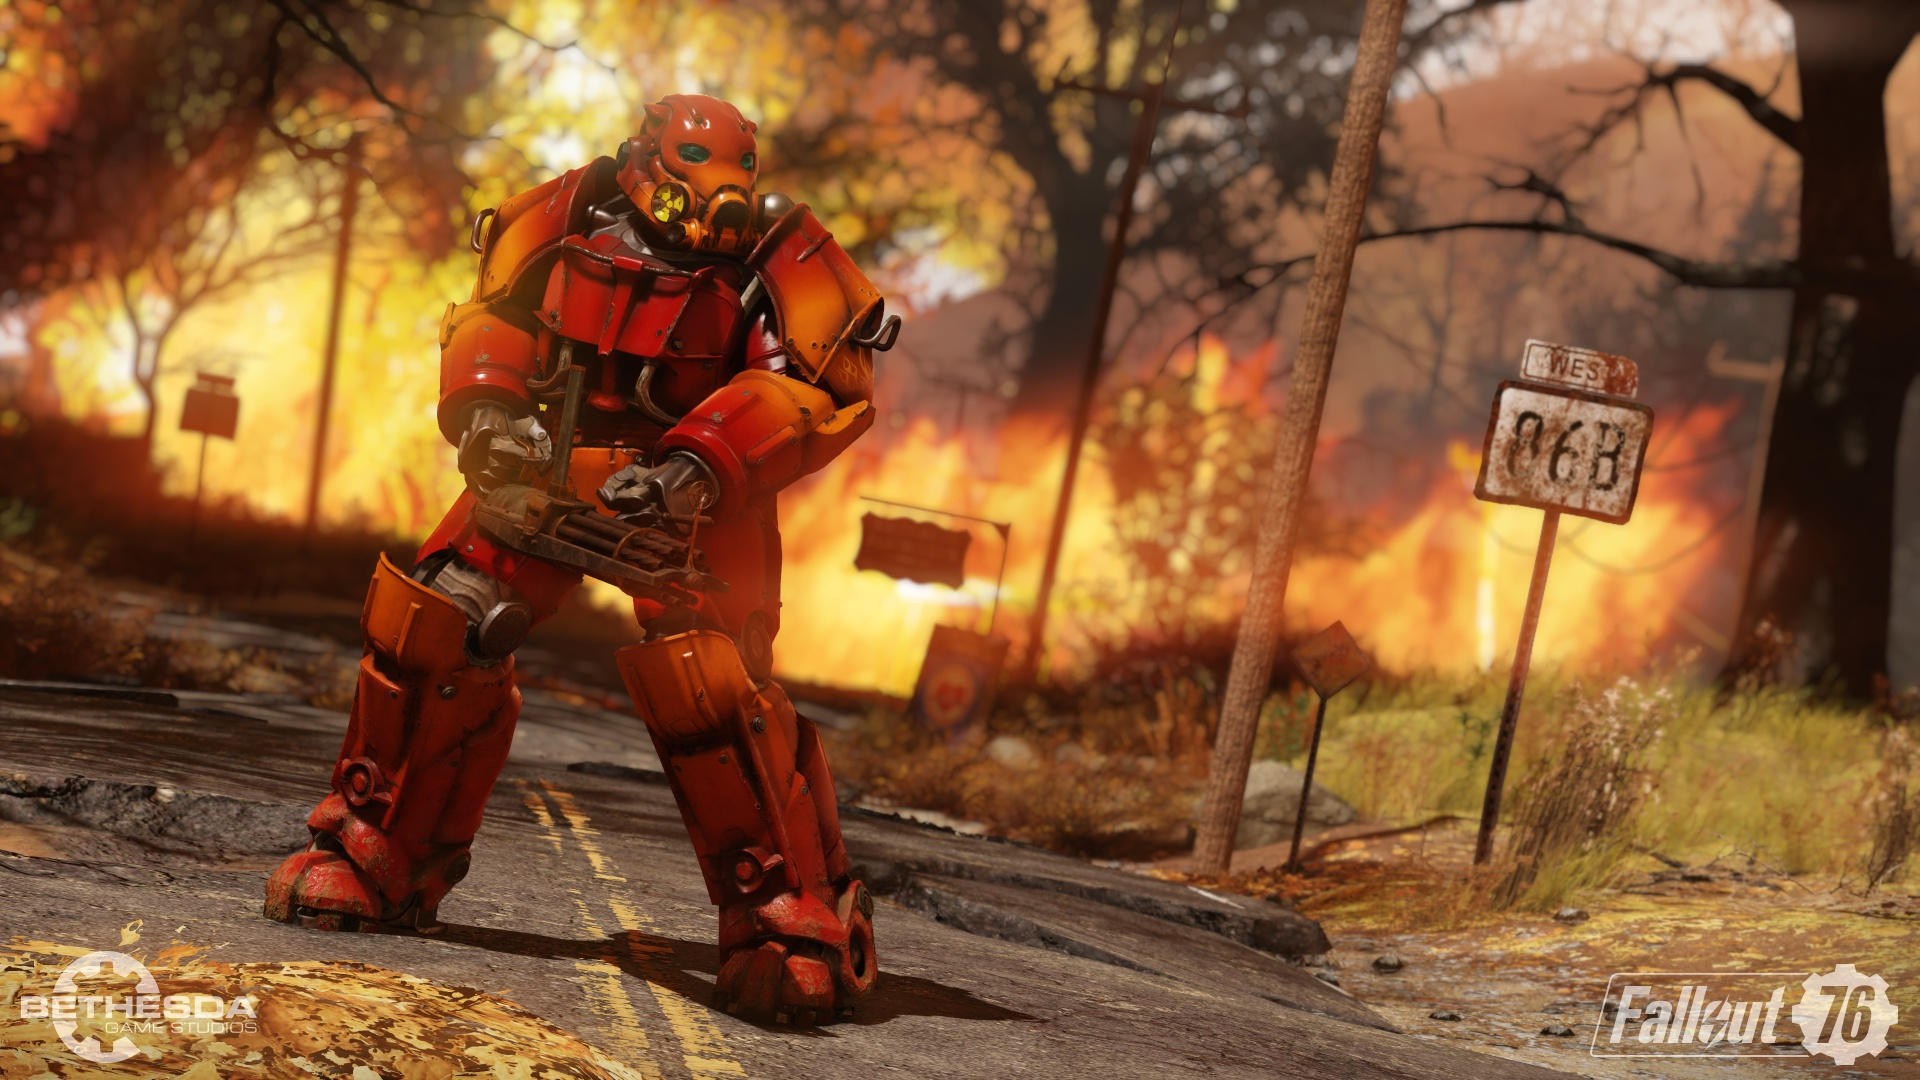 Fallout 76 - Inverno Nuclear